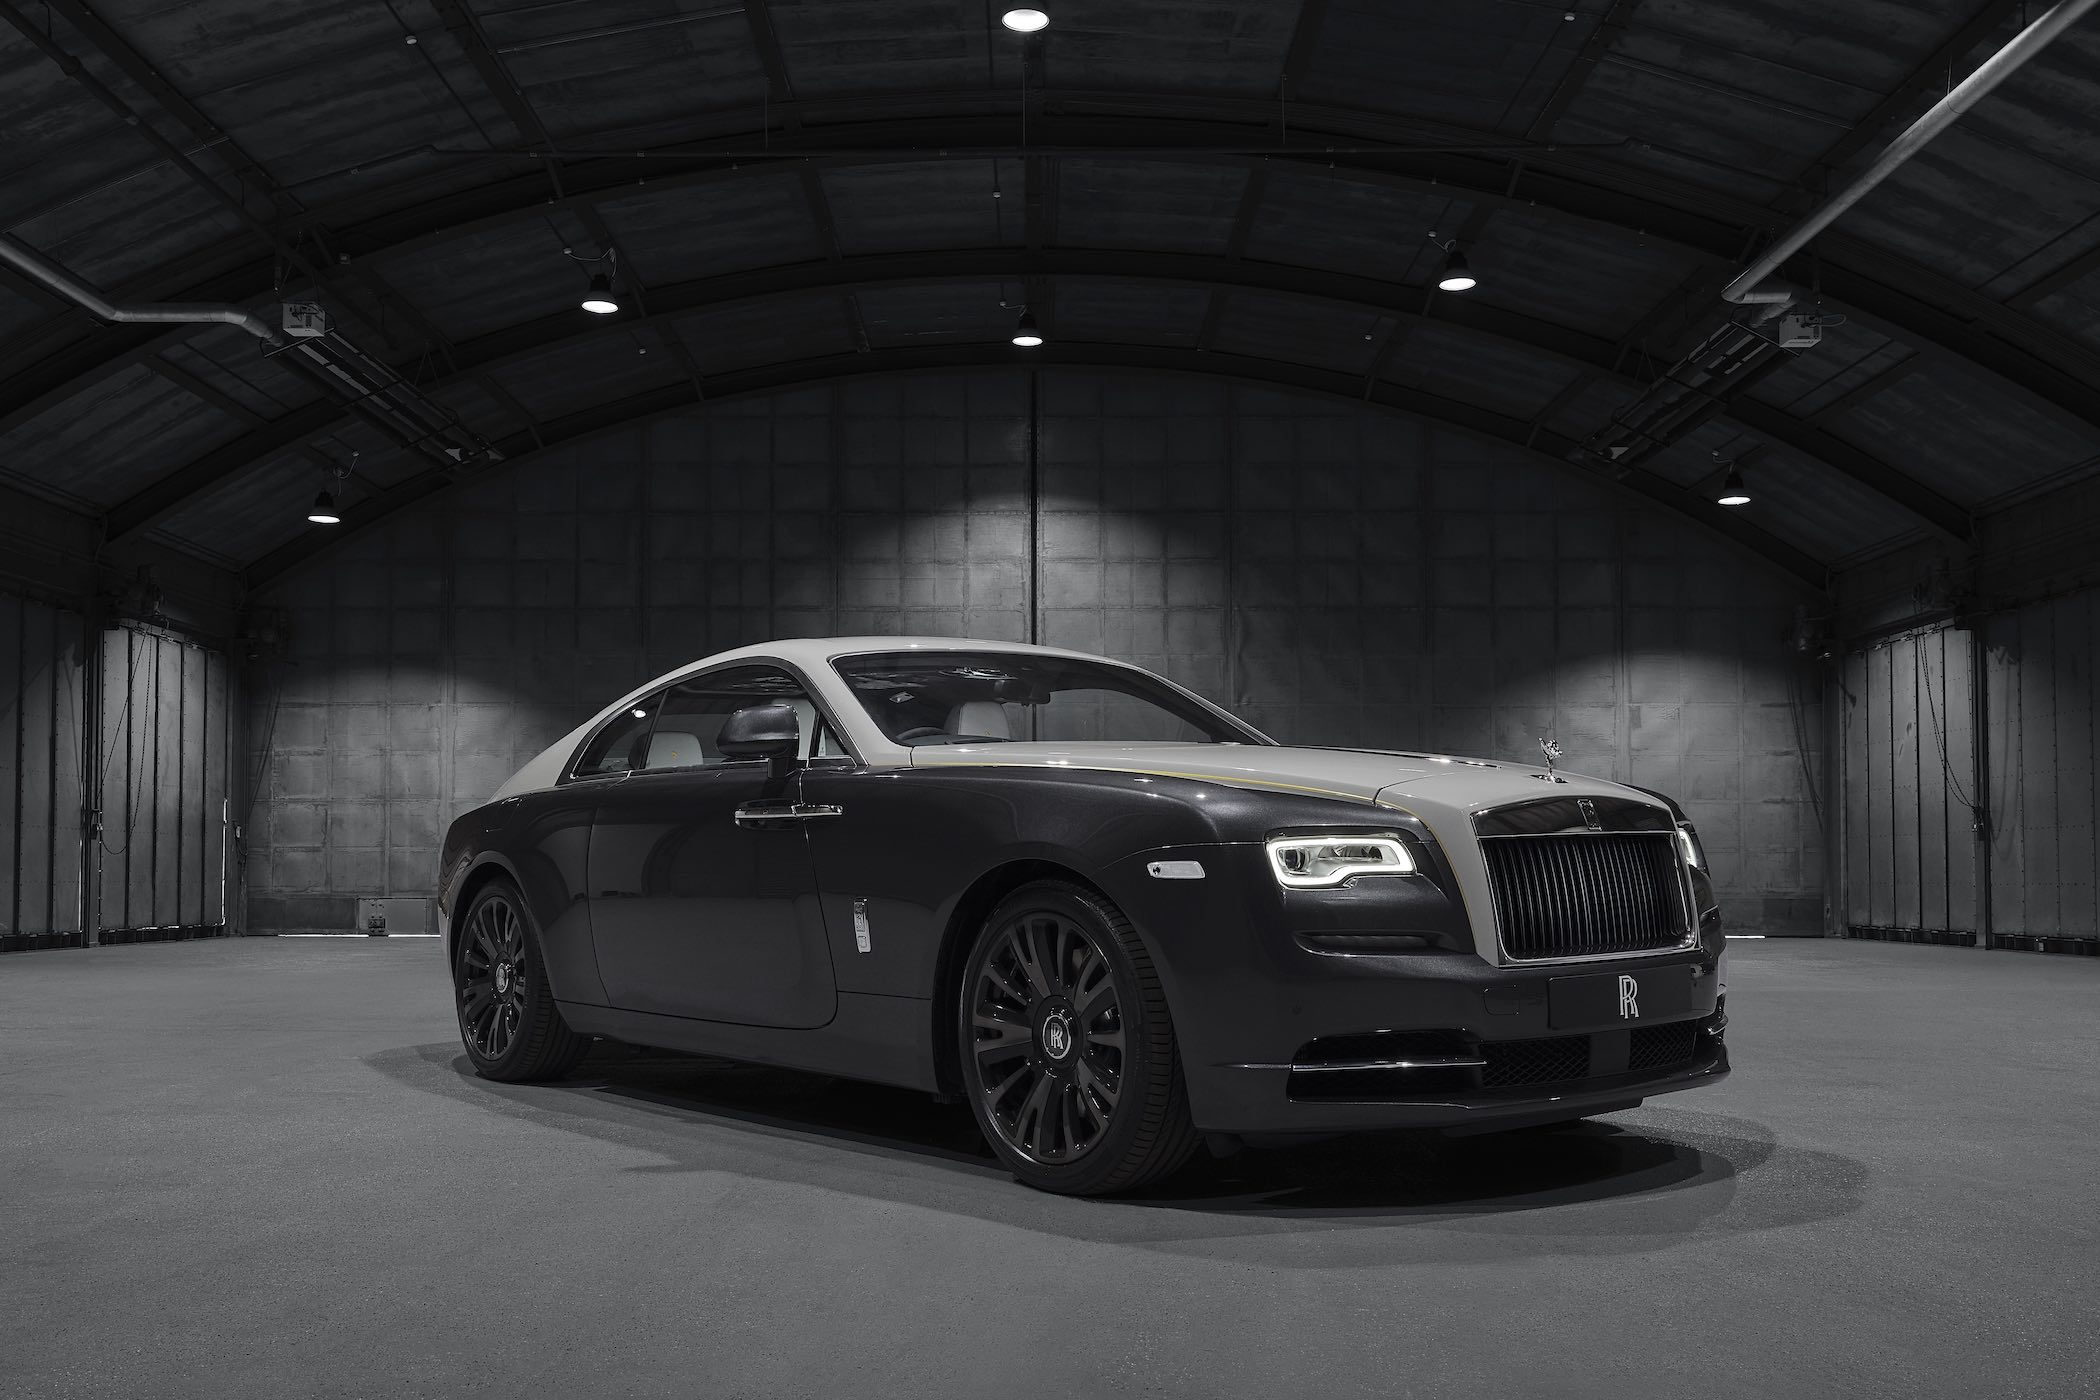 Rolls Royce Wraith Eagle VIII Concorso d'Eleganza Villa d'Este